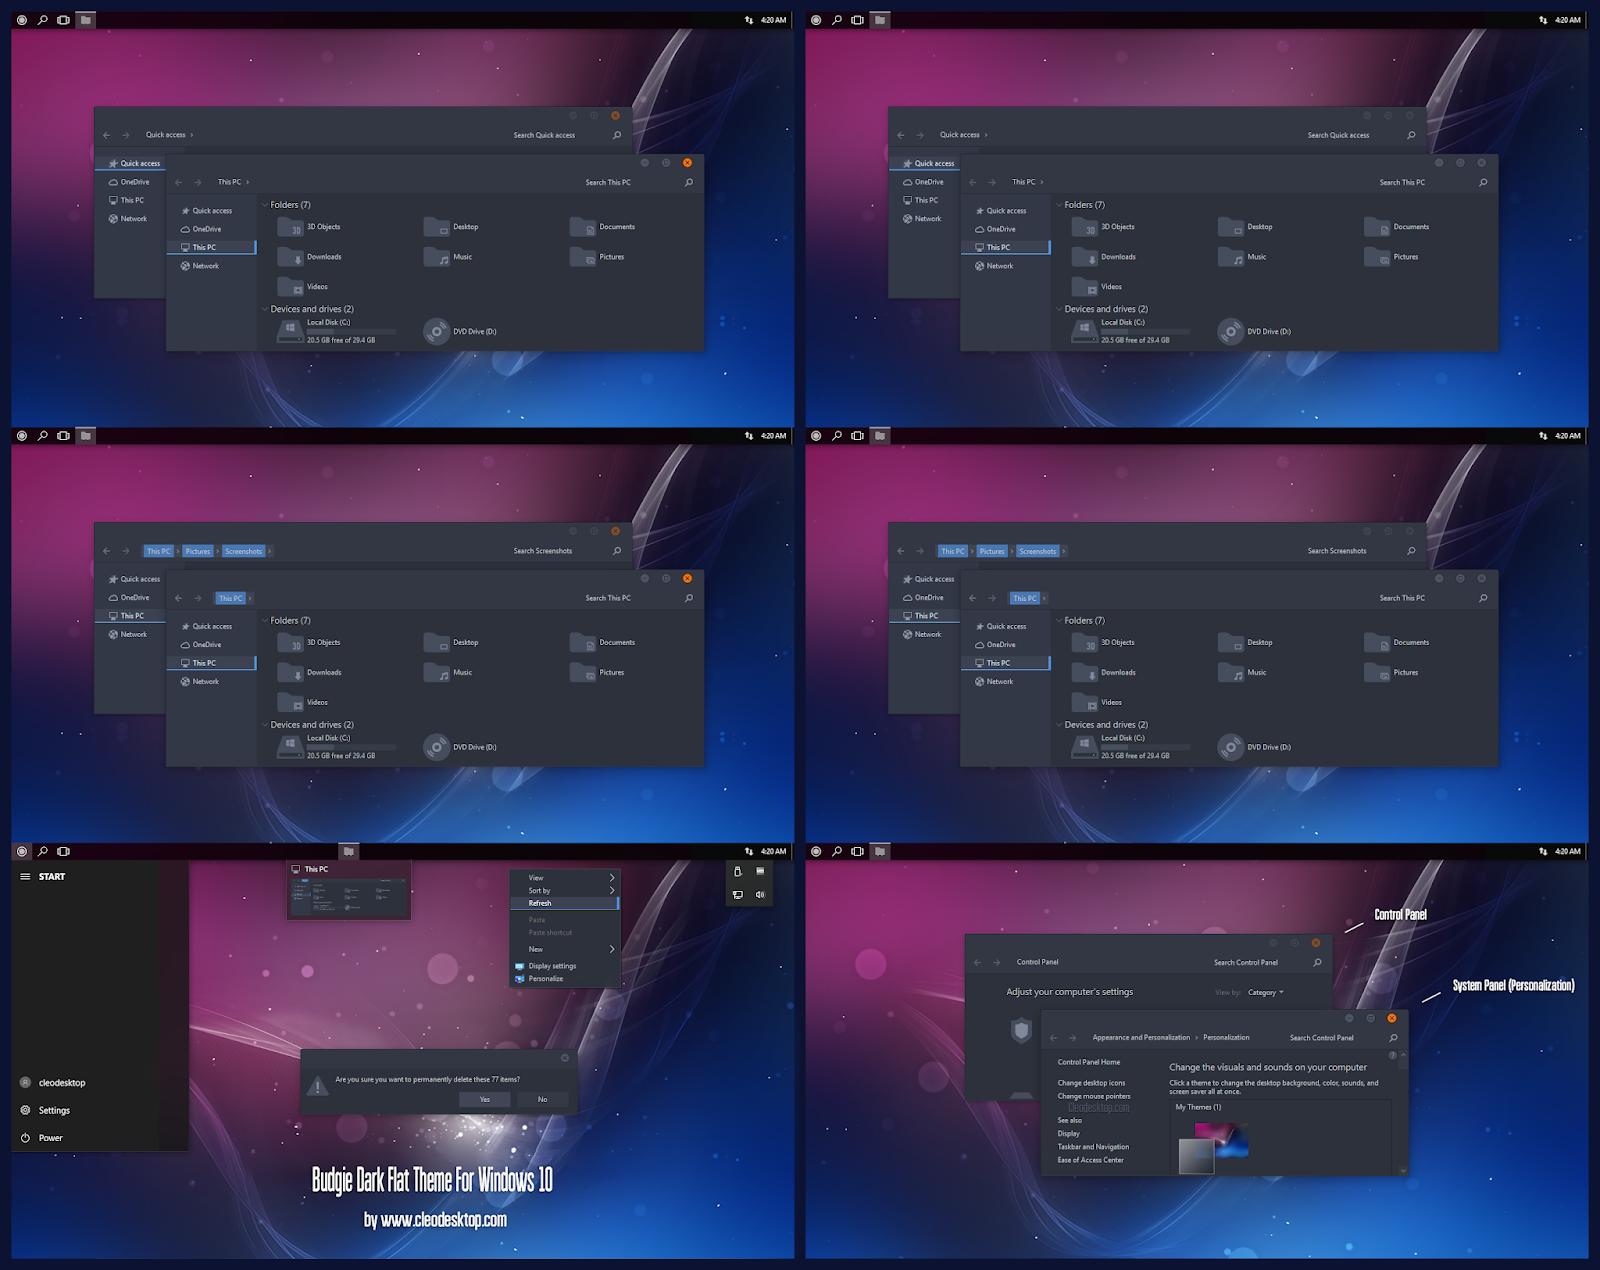 Budgie Dark Flat Theme For Windows10 May 2019 Update 1903